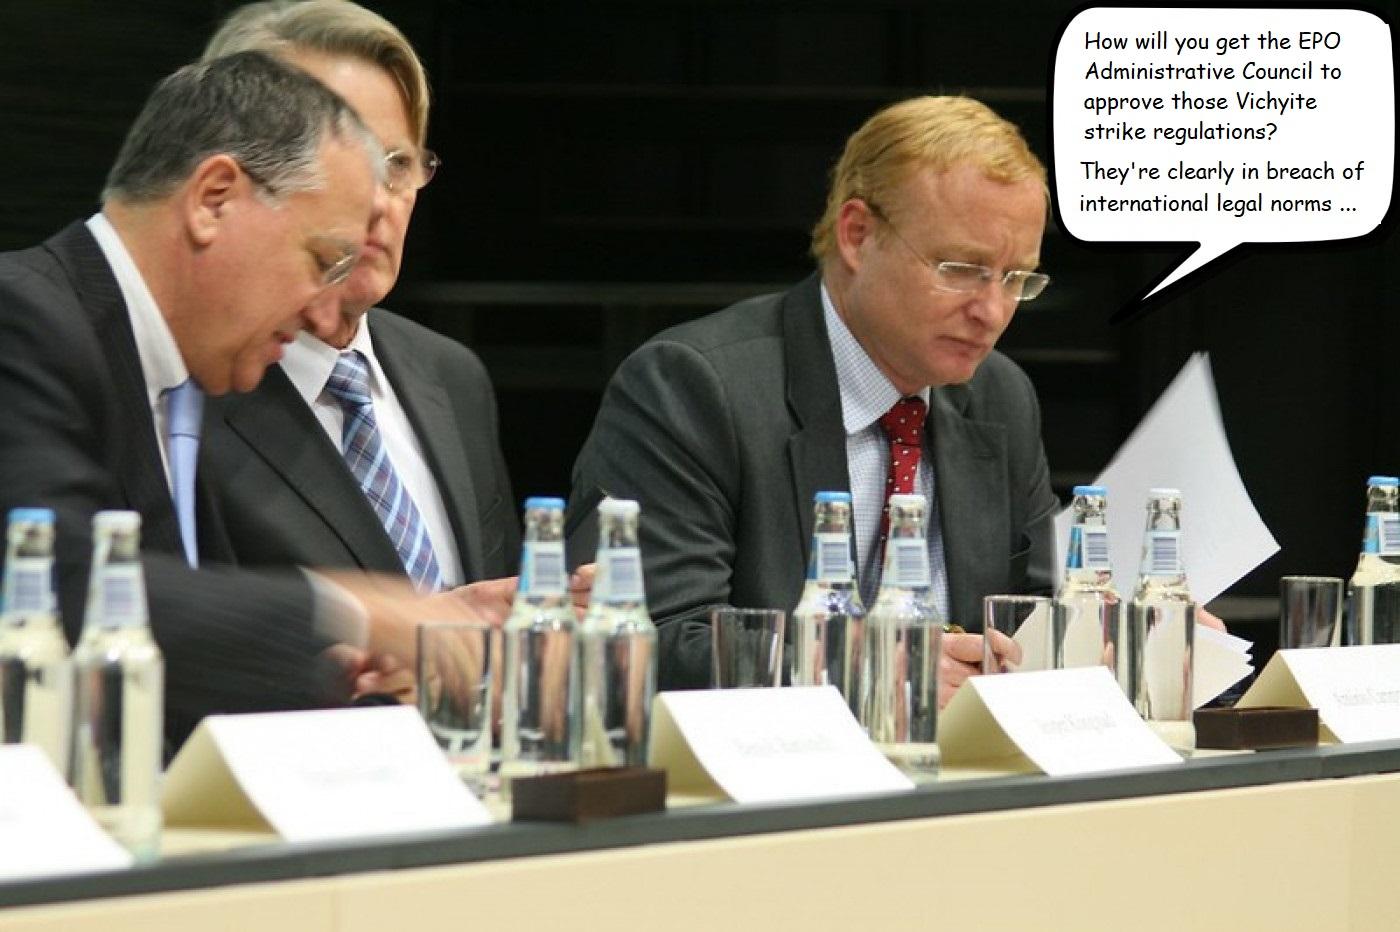 EPO meme part 1 - Campinos